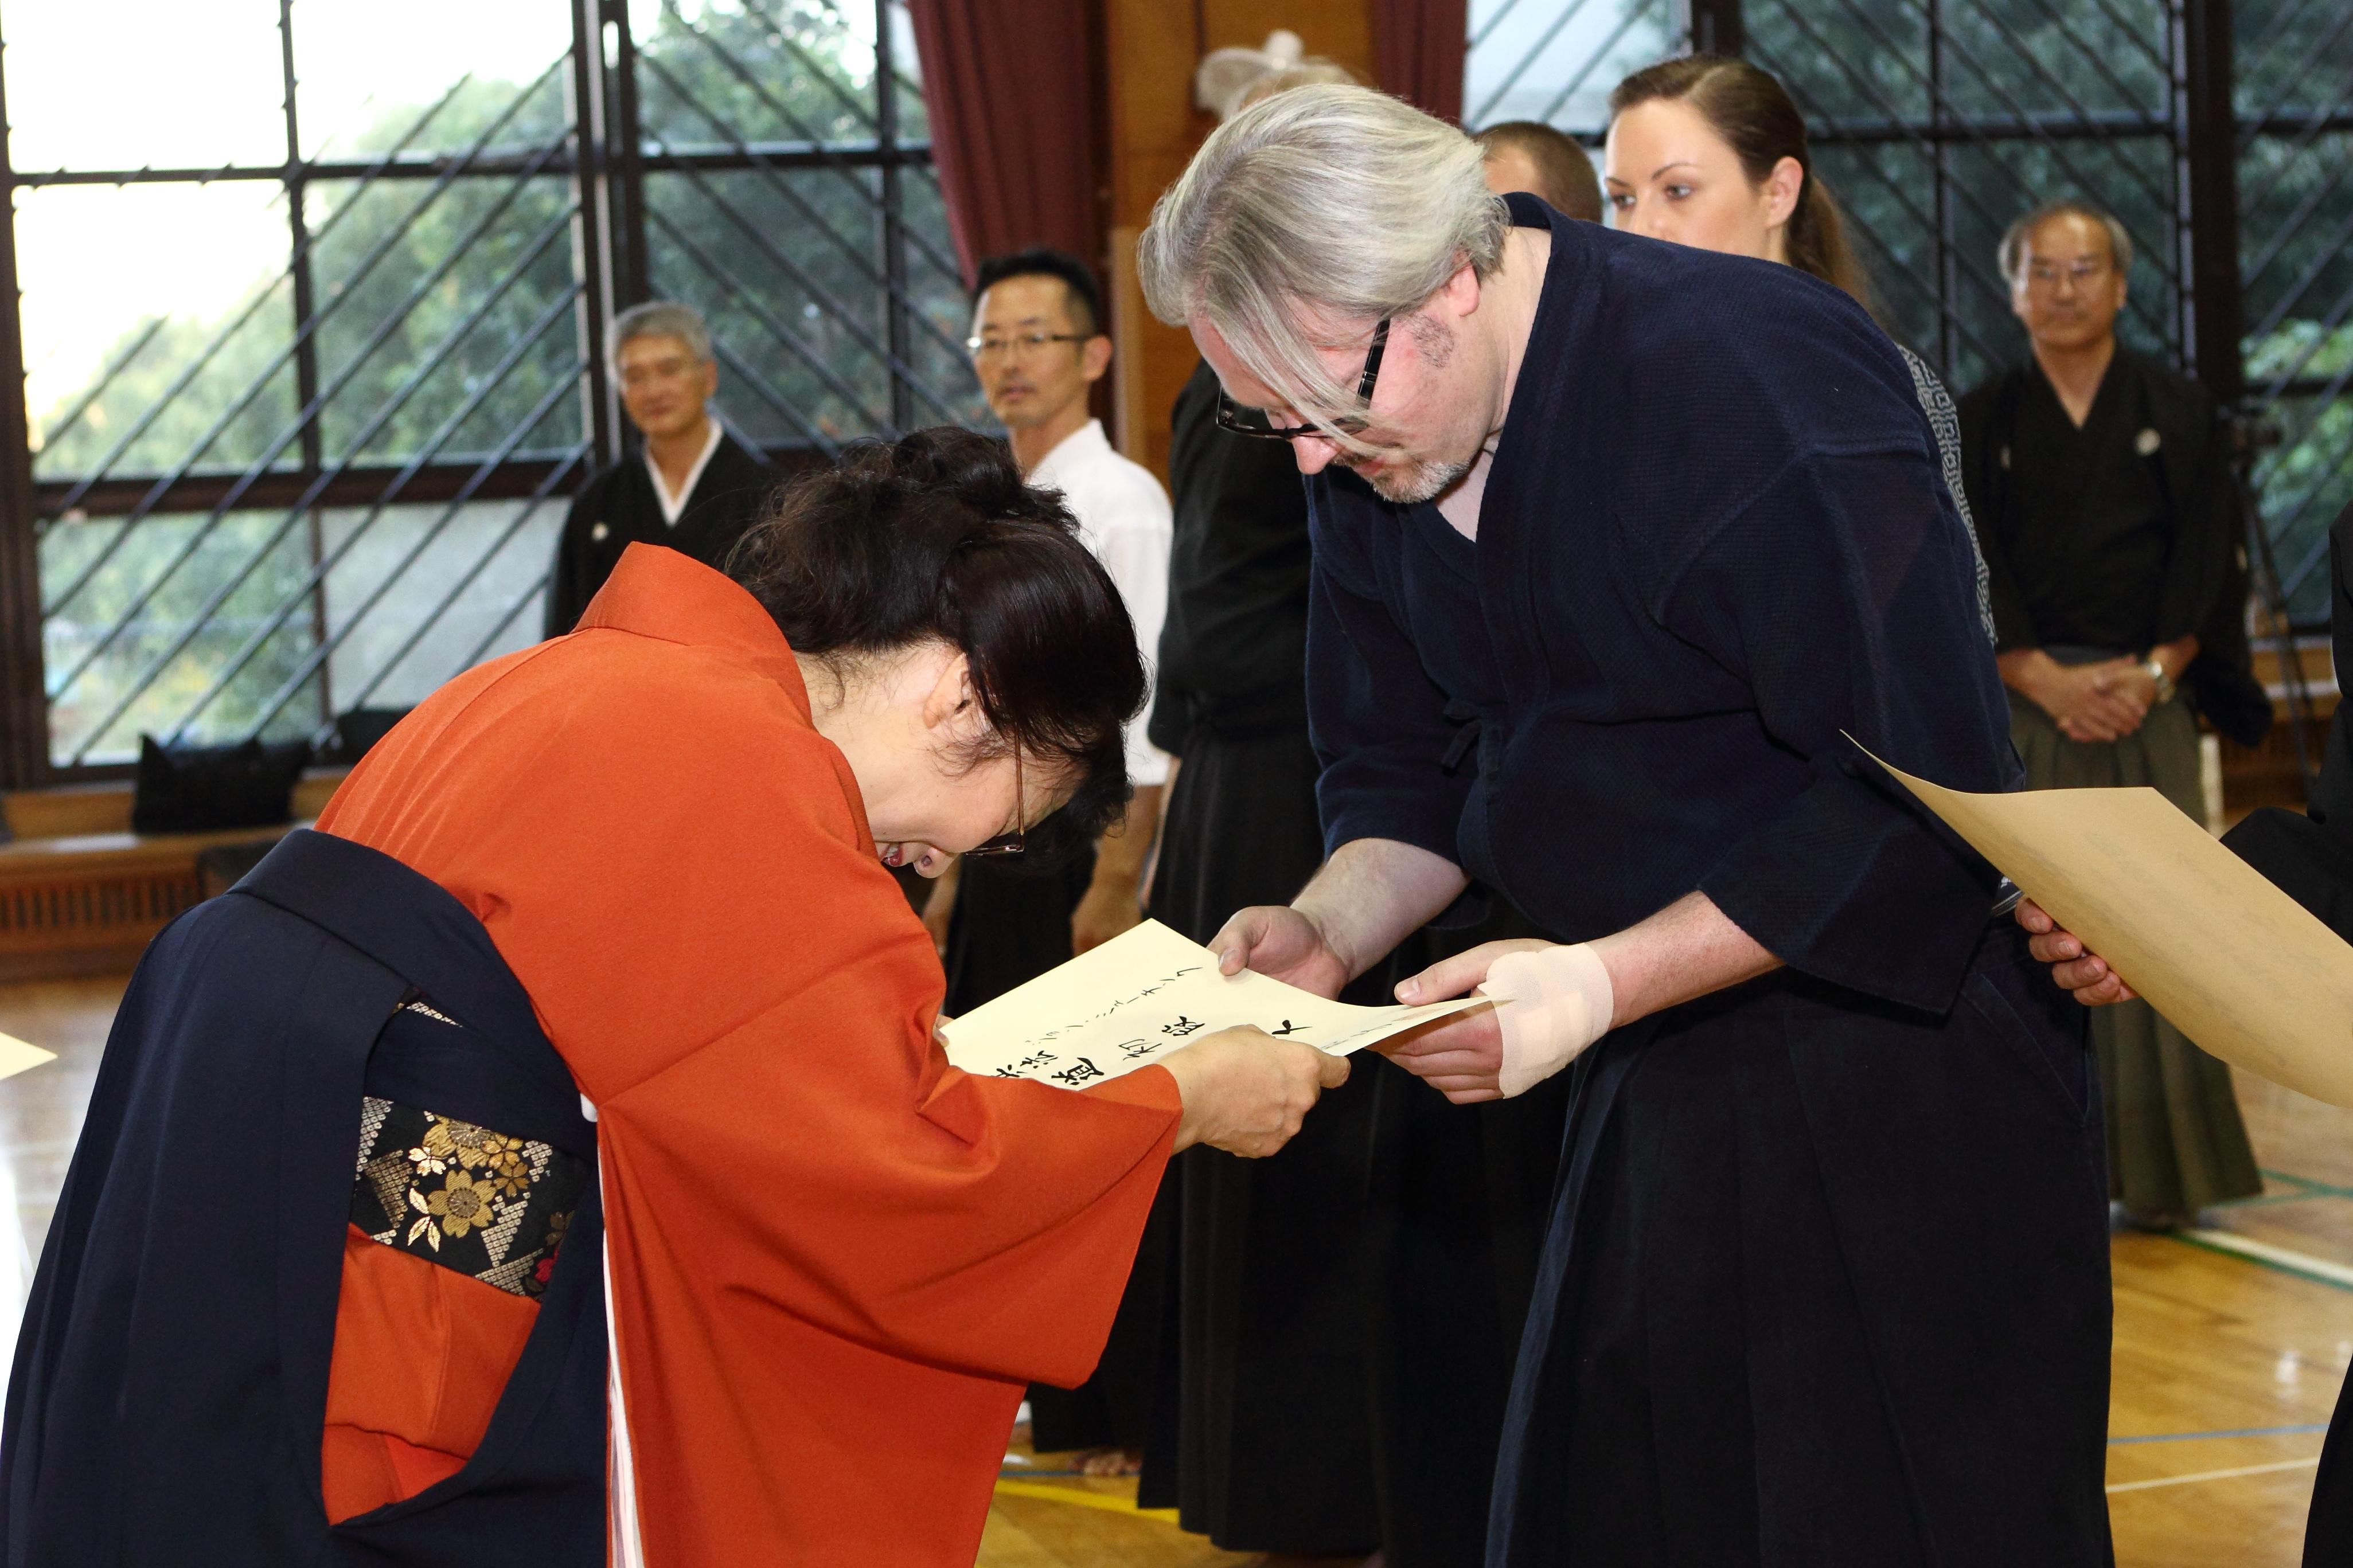 Tex receiving Shodan from Nakamura Tomoko Kaichou.